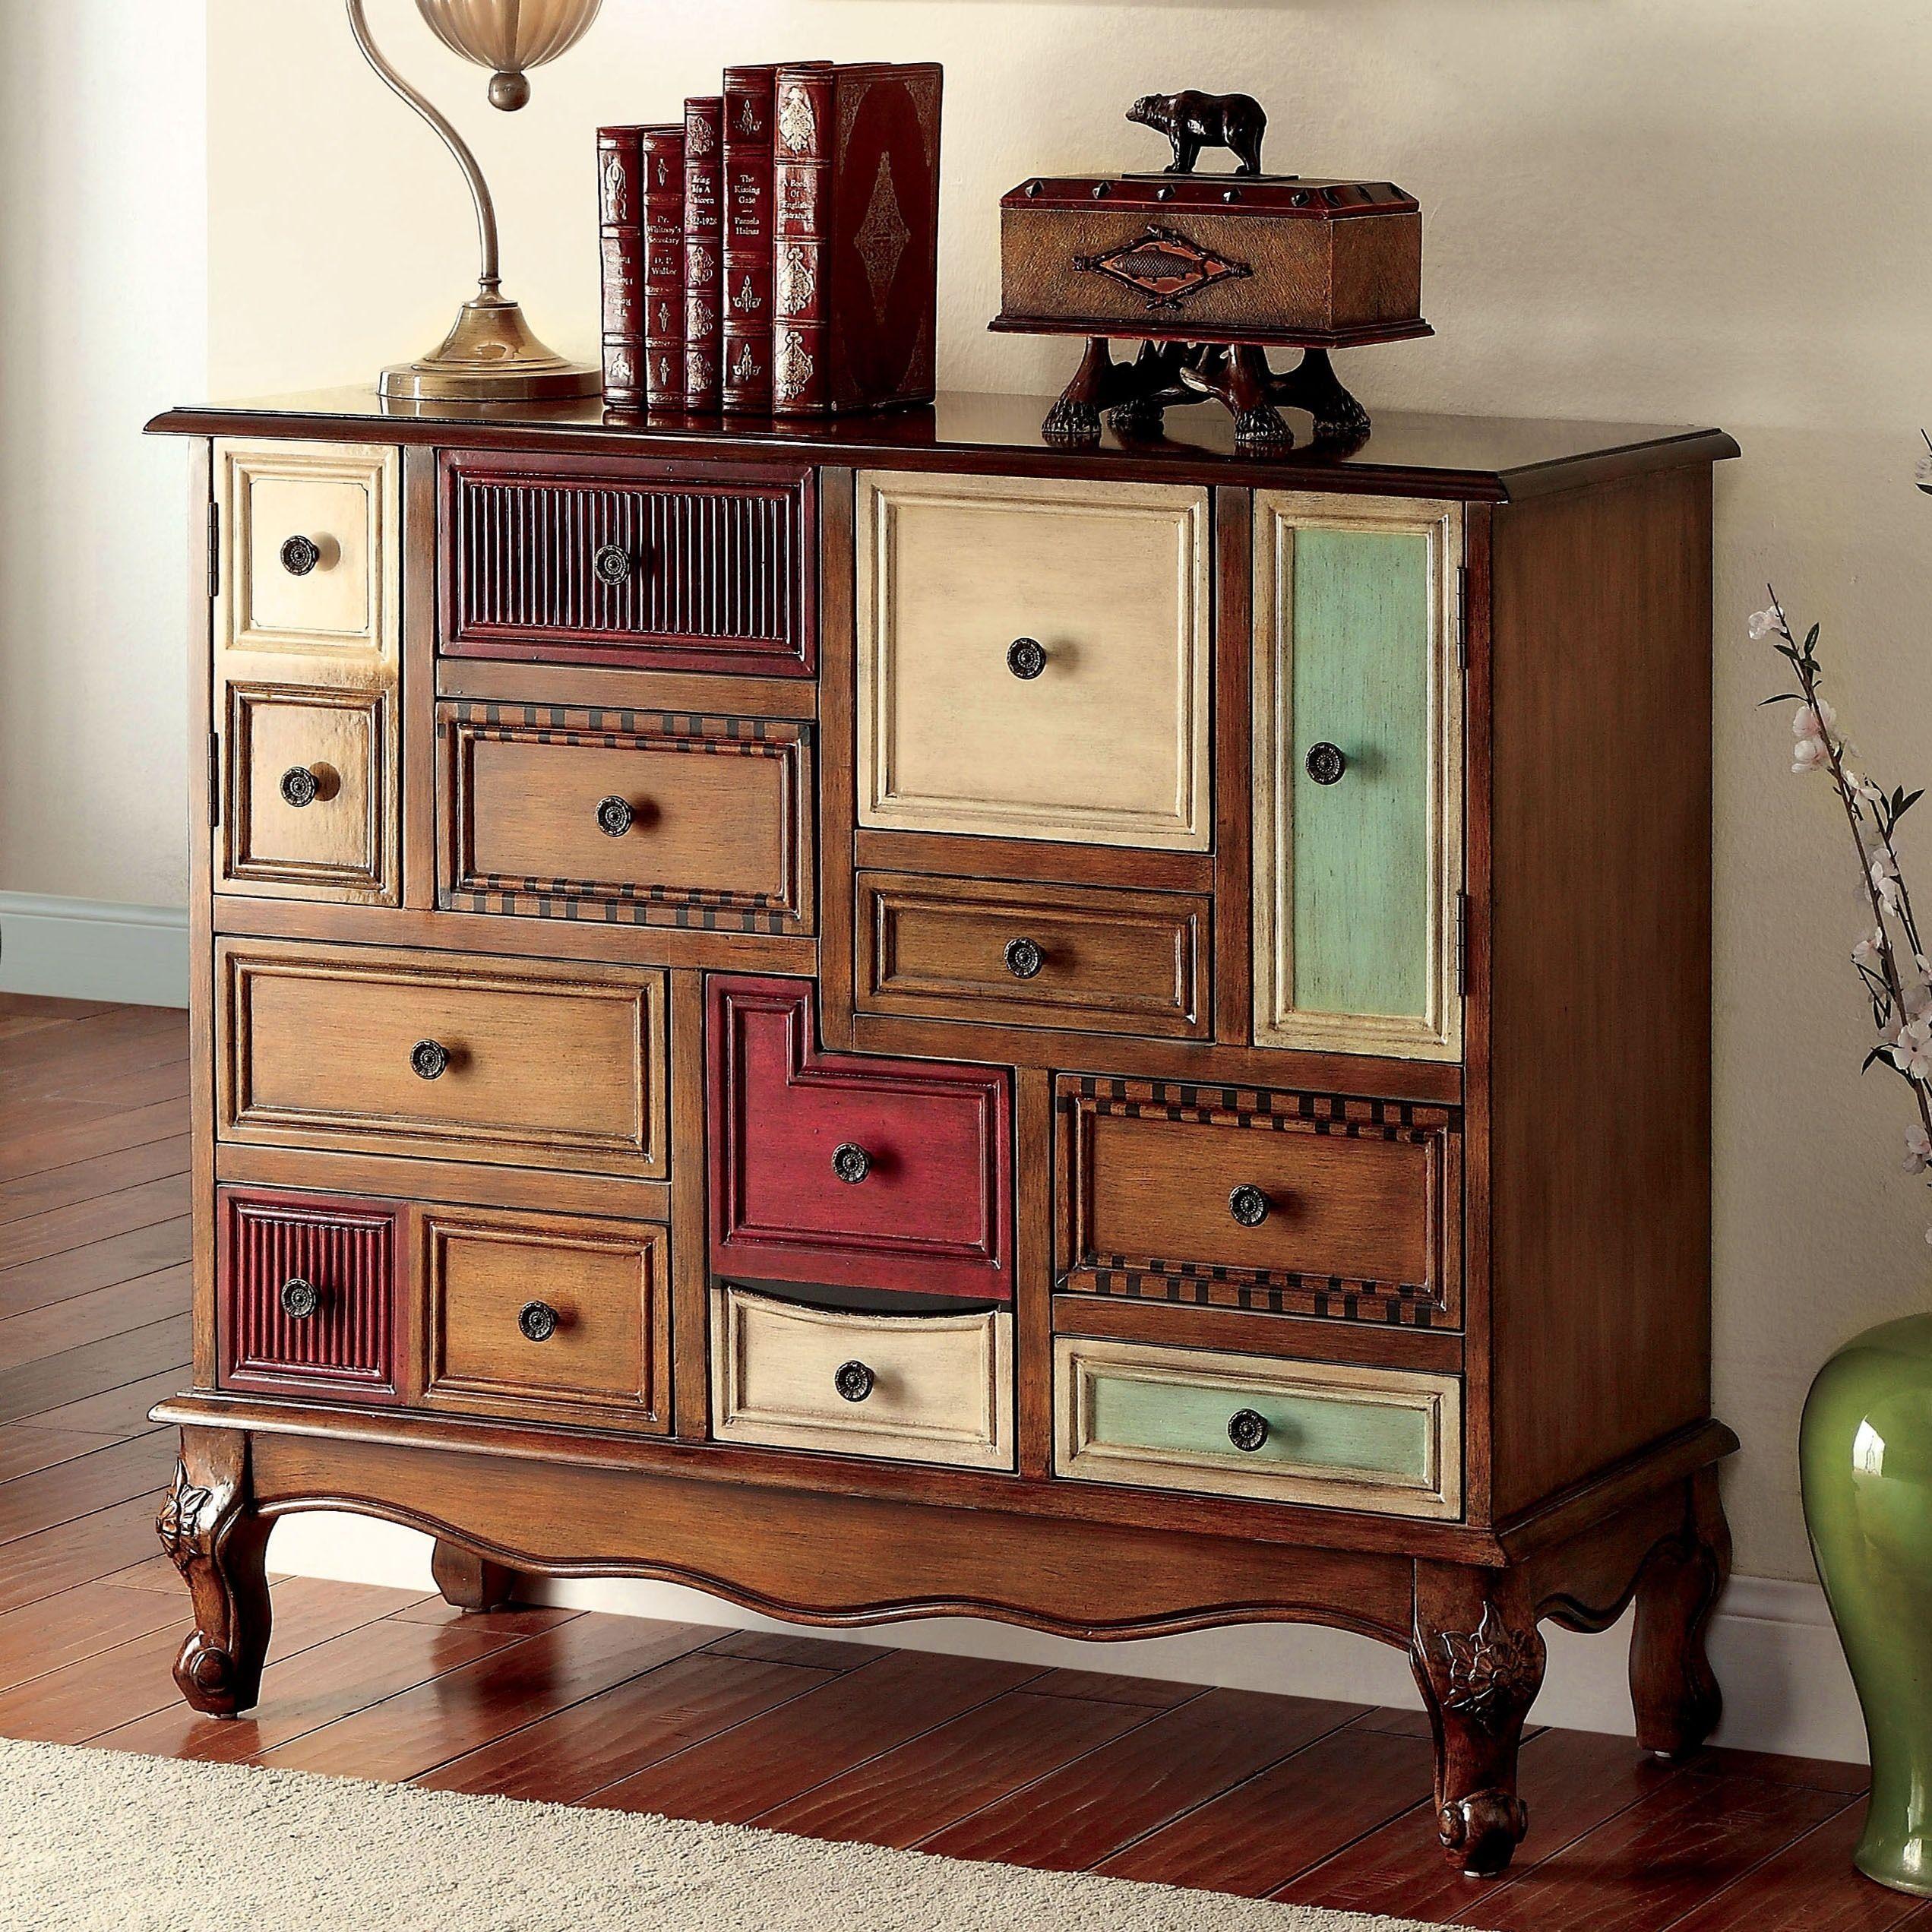 Our Best Living Room Furniture Deals Furniture Of America Furniture Decor